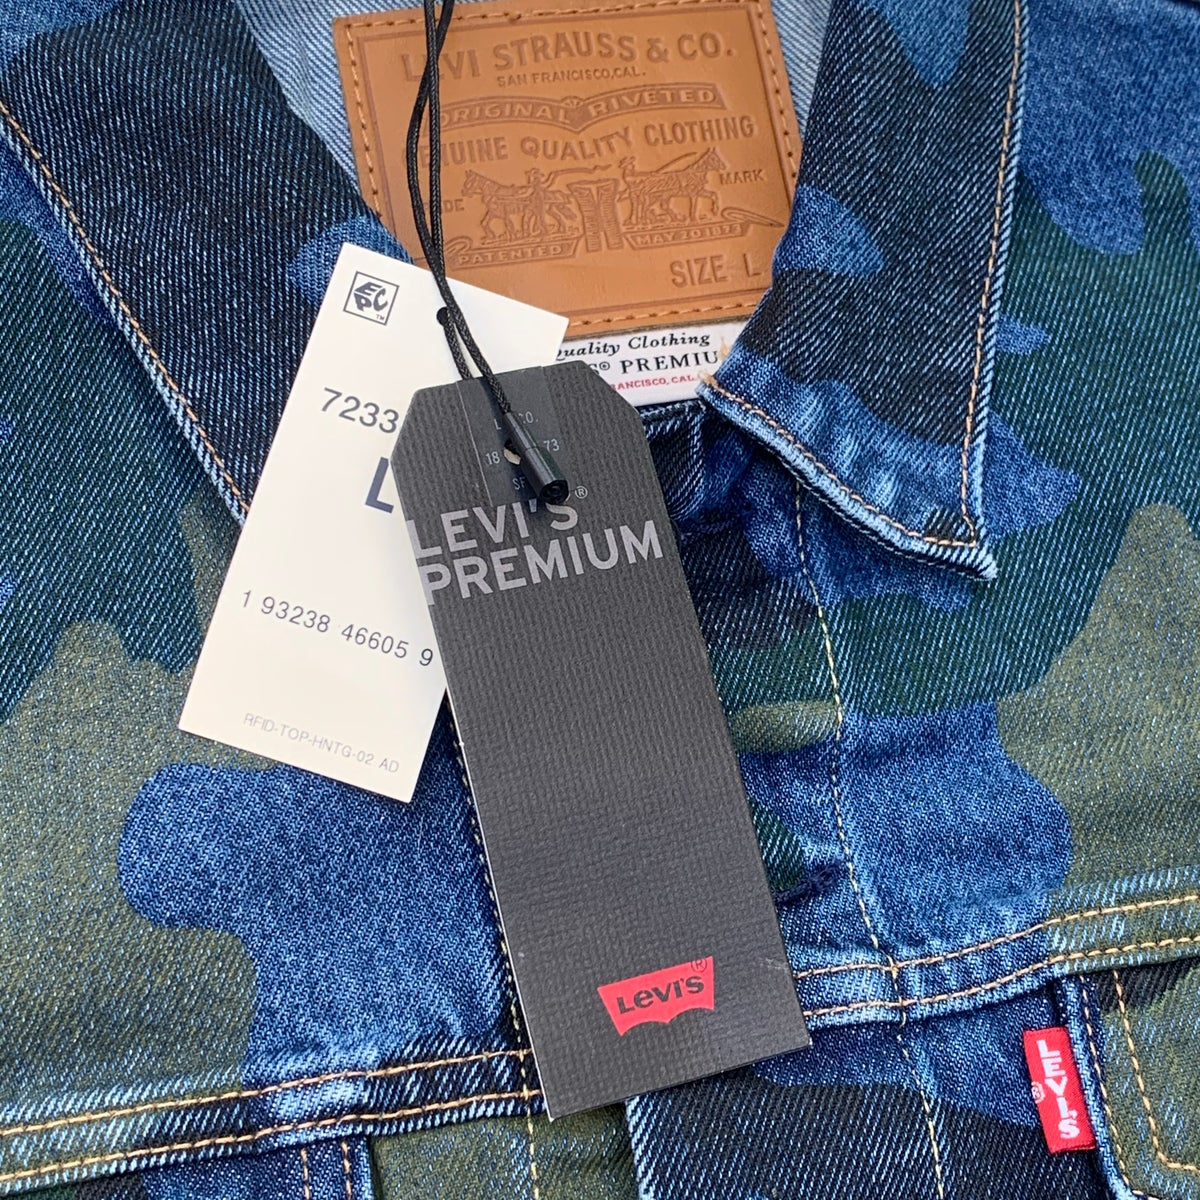 NEW Custom Ice Cream Bear Embroidered Premium NEW Camo Levi's Jacket!!